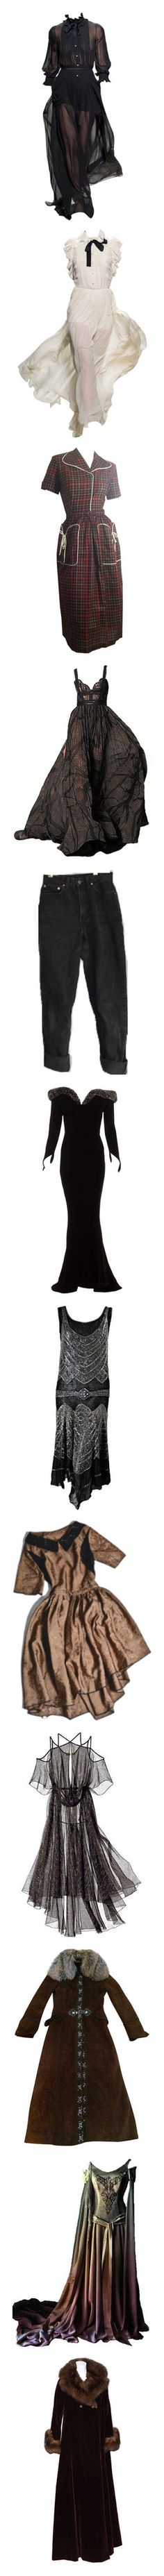 """Tardis wardrobe"" by georginasmith-wastaken ❤ liked on Polyvore featuring dresses, gowns, edits, the dresses, 1940s, tartan plaid dresses, pocket dress, long plaid dress, plaid dress and red day dress"